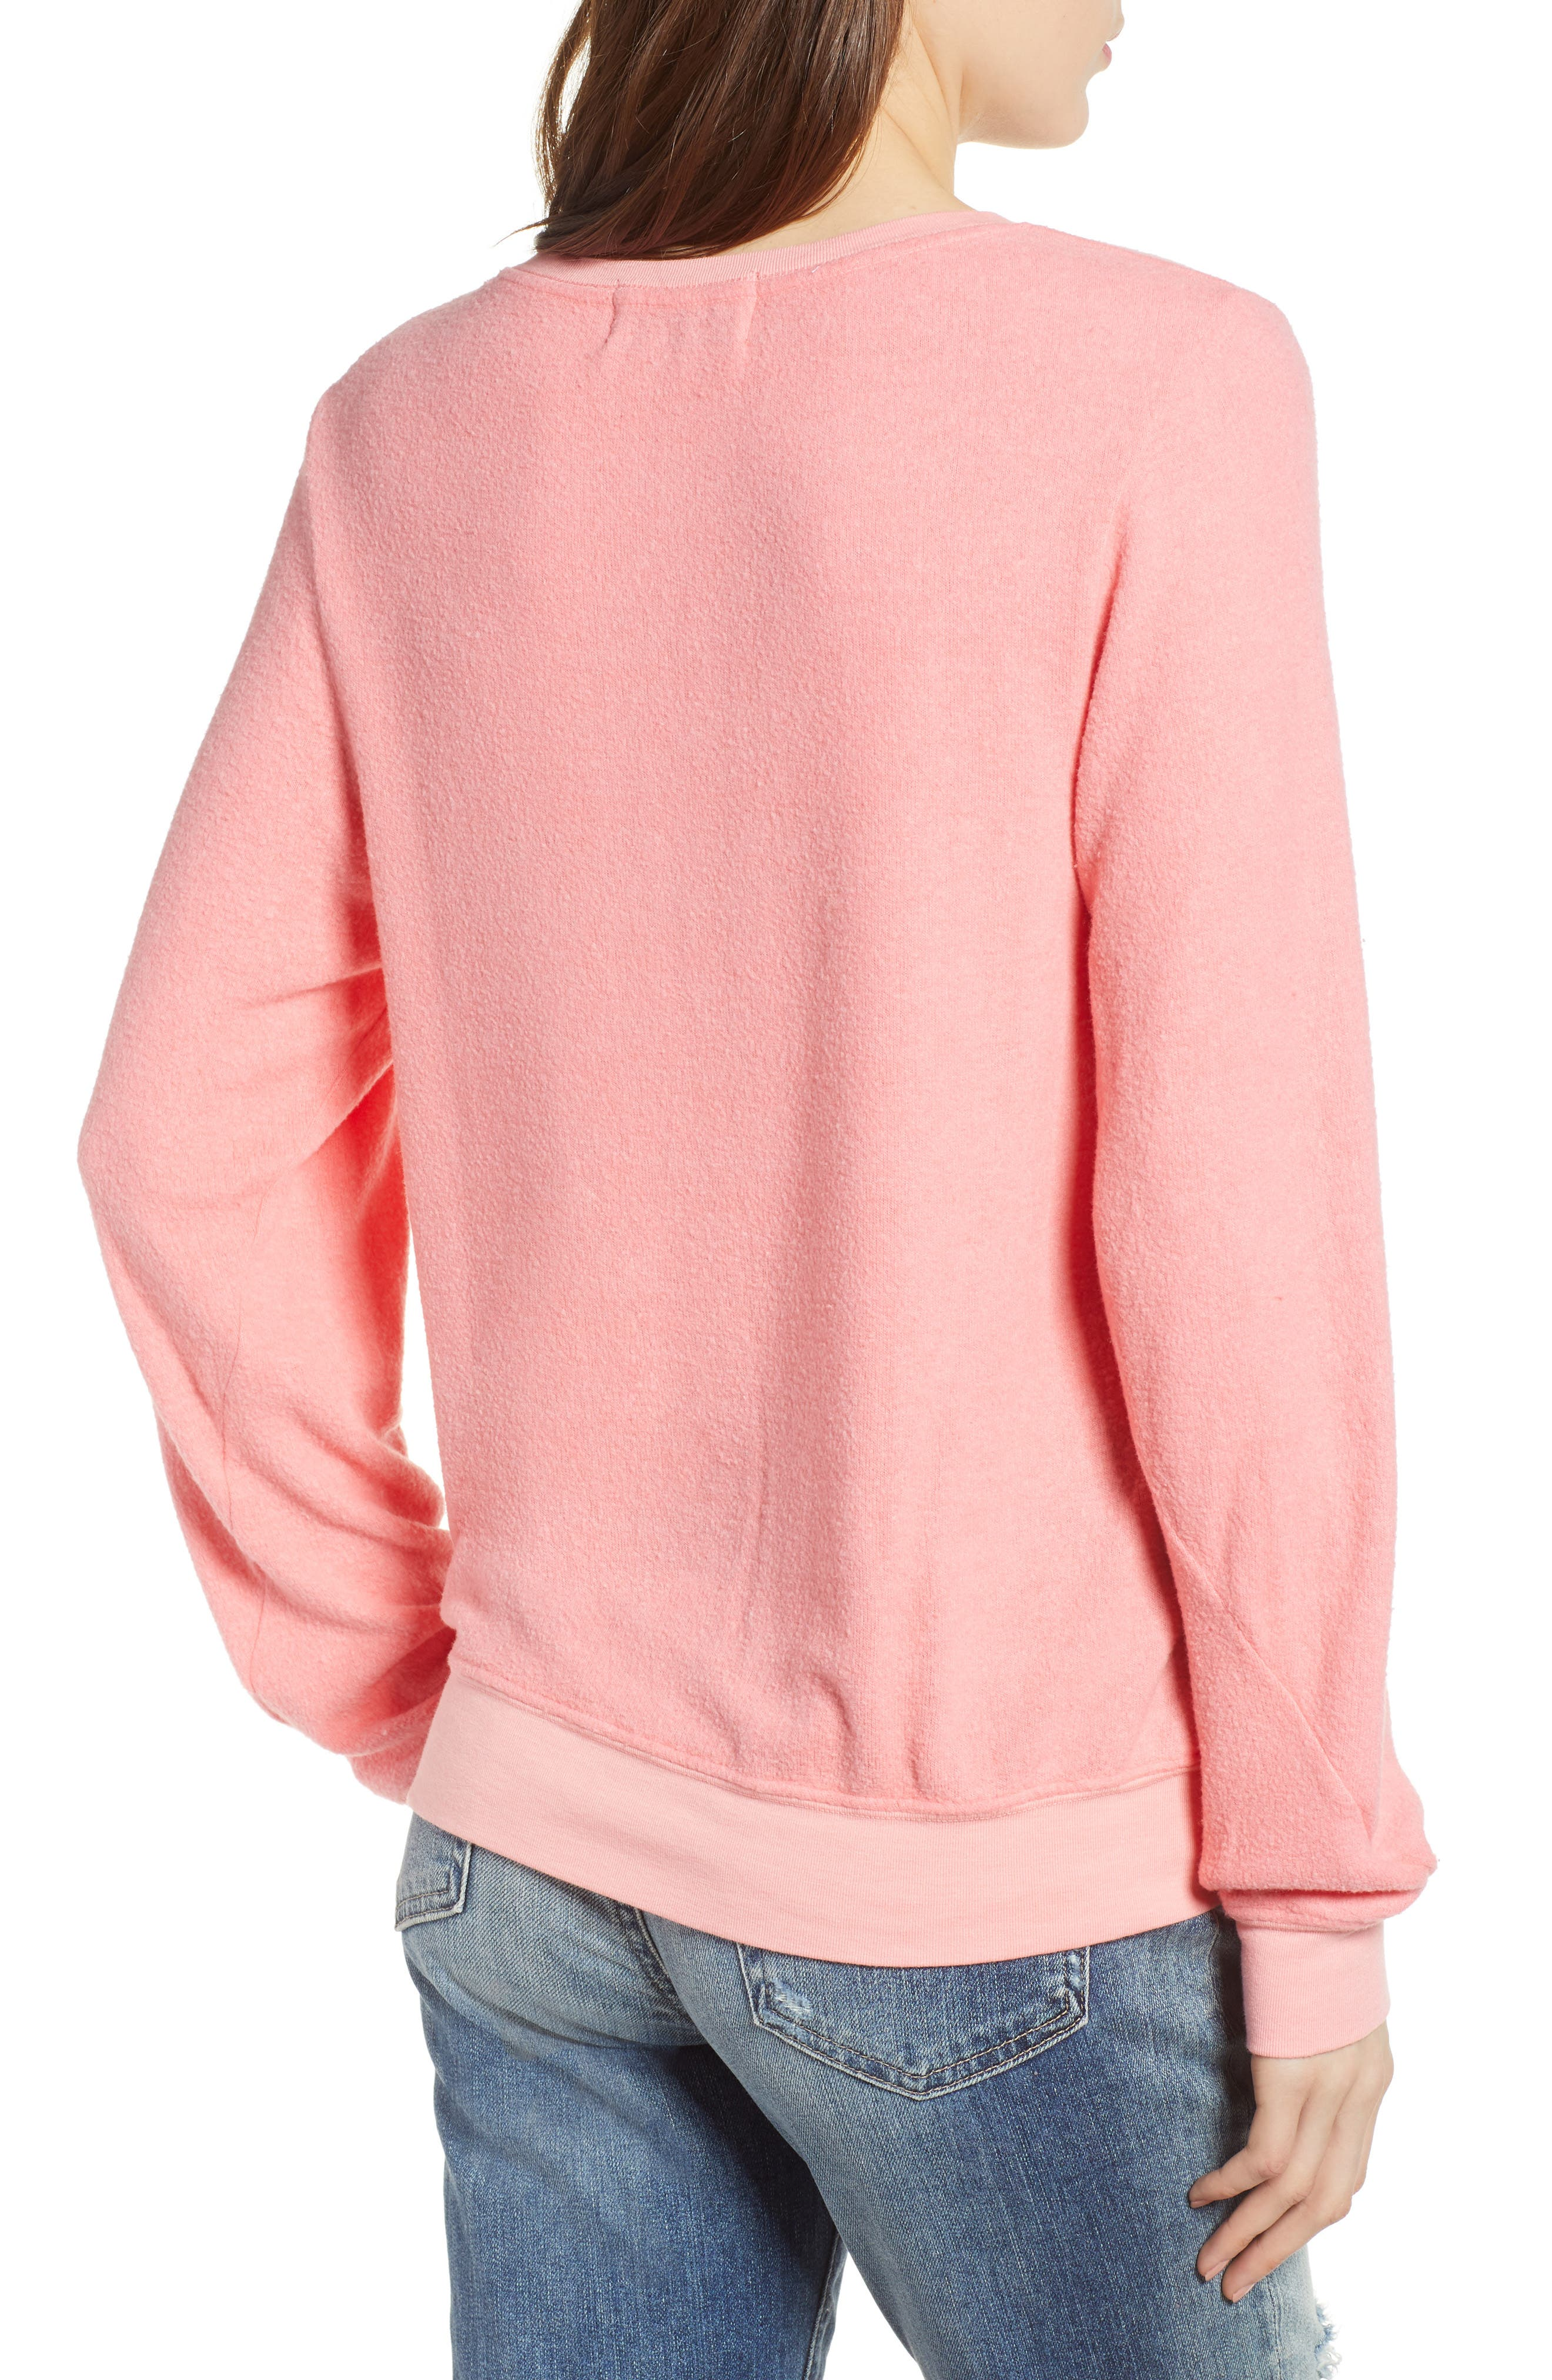 Pardon My French Sweatshirt,                             Alternate thumbnail 2, color,                             Peach Crush